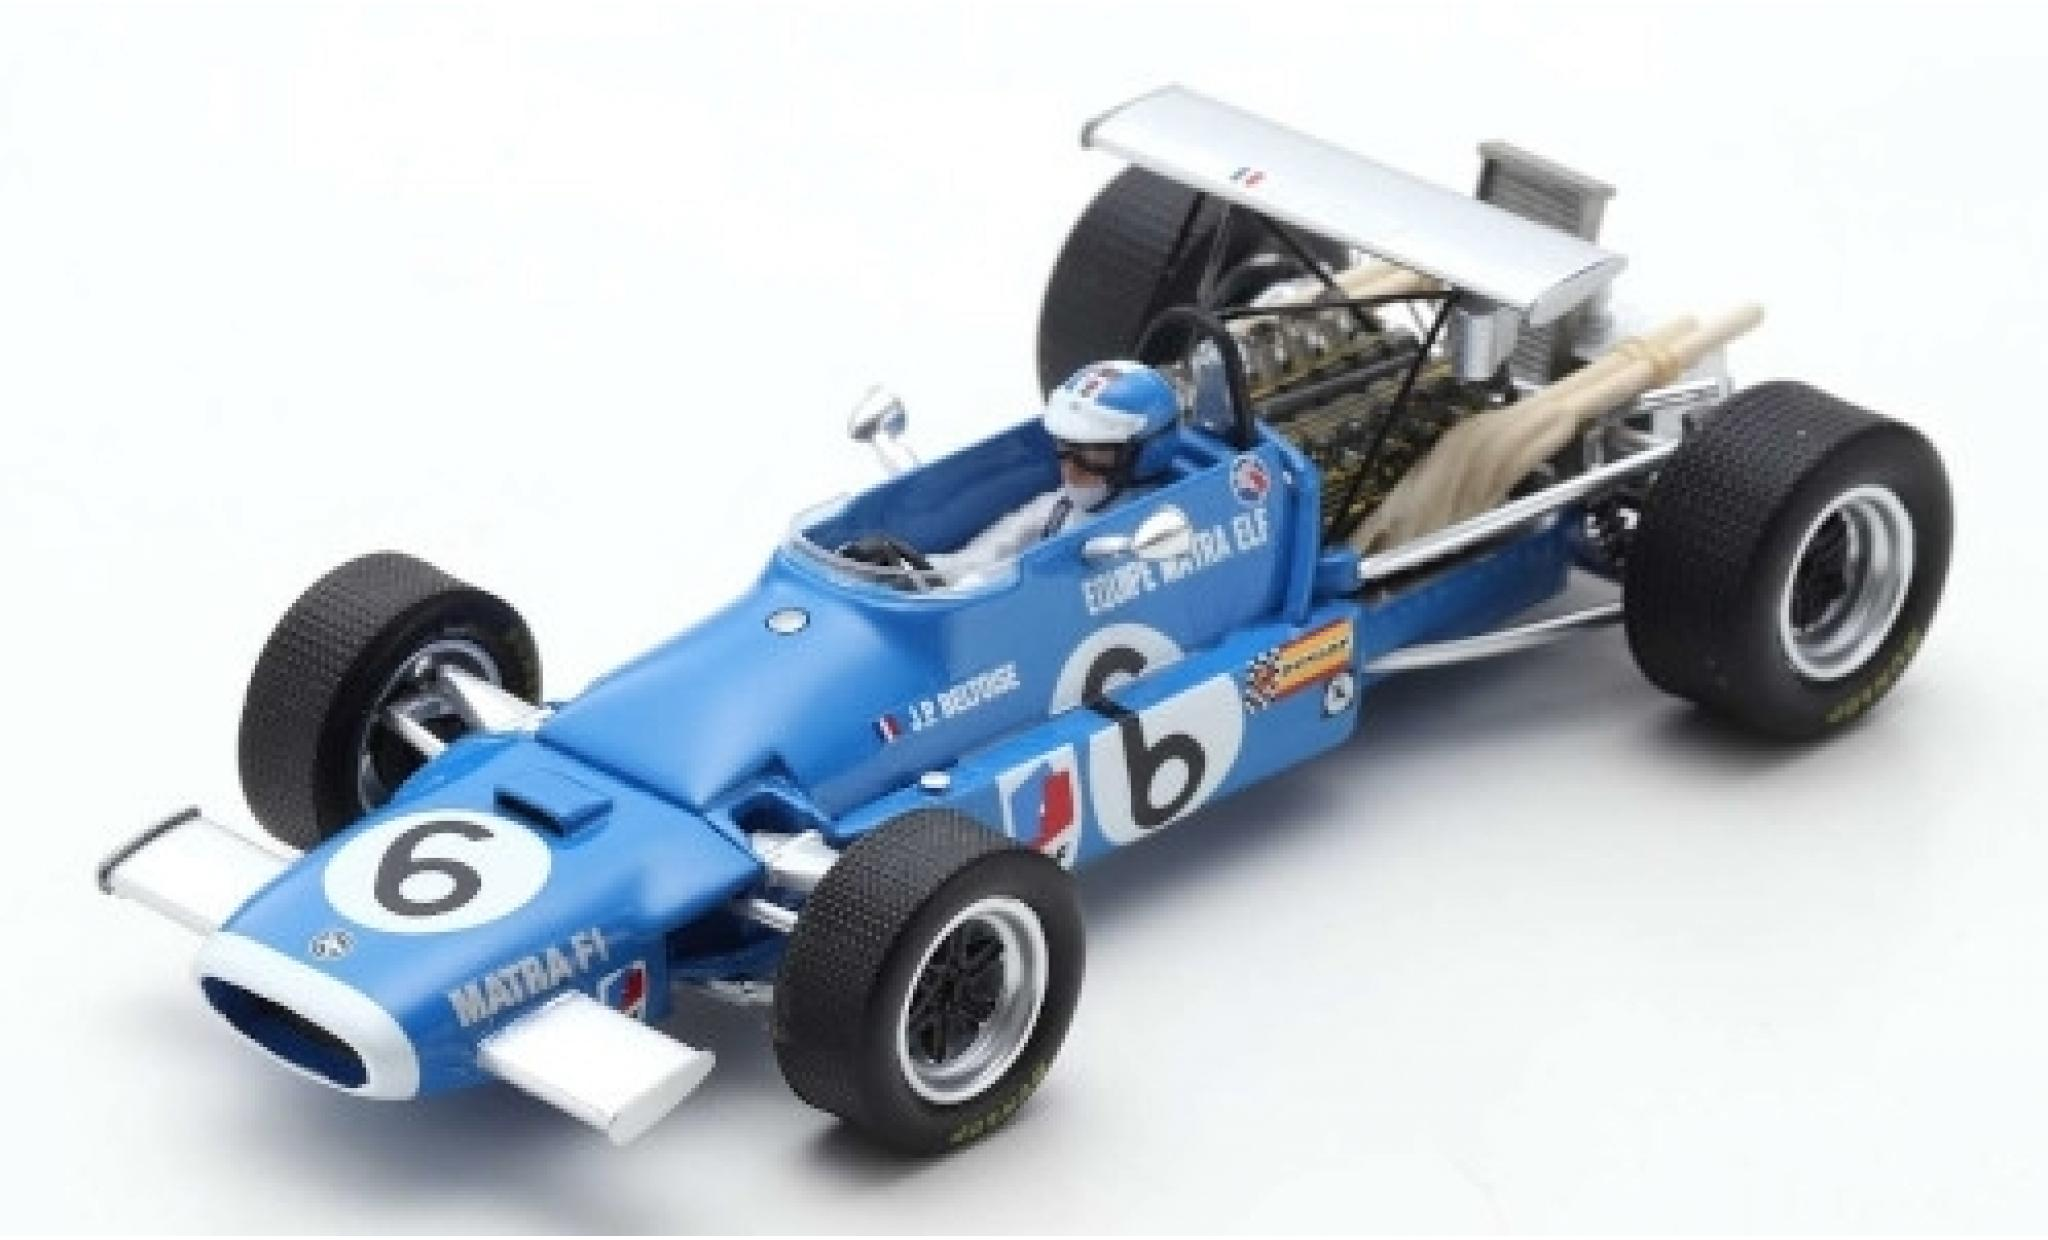 Matra MS1 1/43 Spark 1 No.6 Equipe Elf Formel 1 GP Italien 1968 J-P.Beltoise